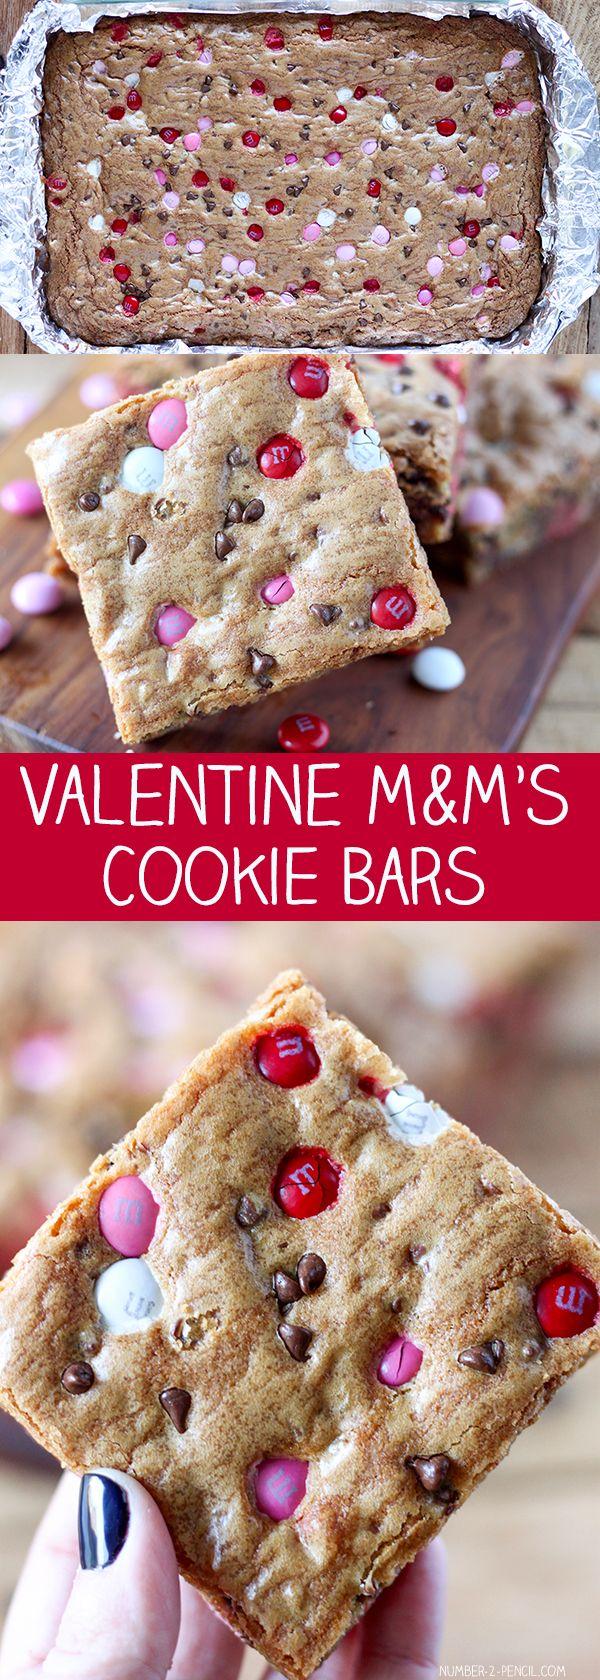 MandM'S Valentine's Day Cookie Bars